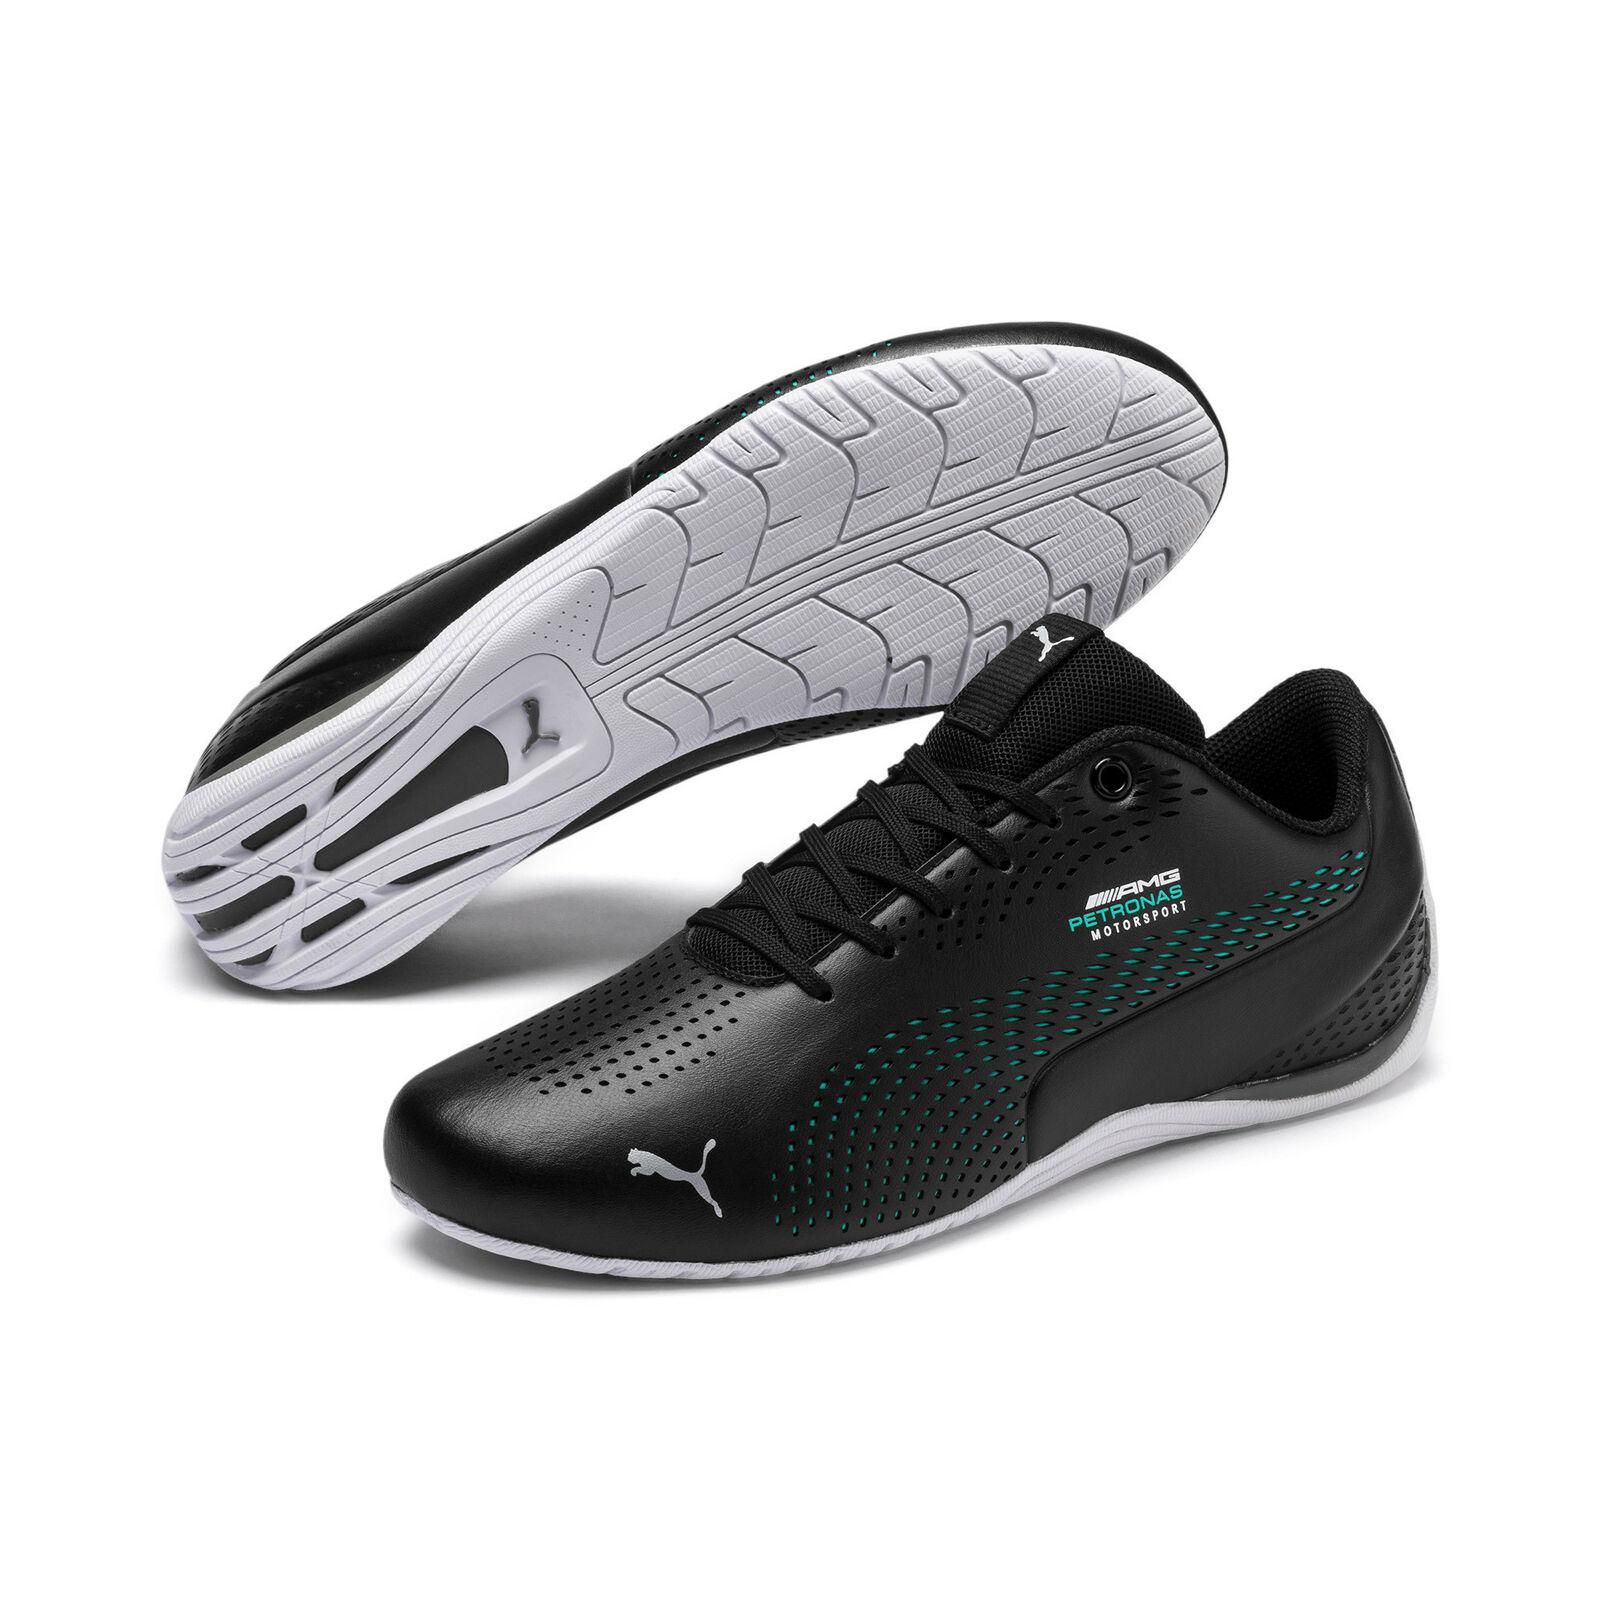 Bild zu Herren Sneaker Puma Mercedes AMG Petronas Drift Cat 5 Ultra II für 38,39€ (Vergleich: 70€)